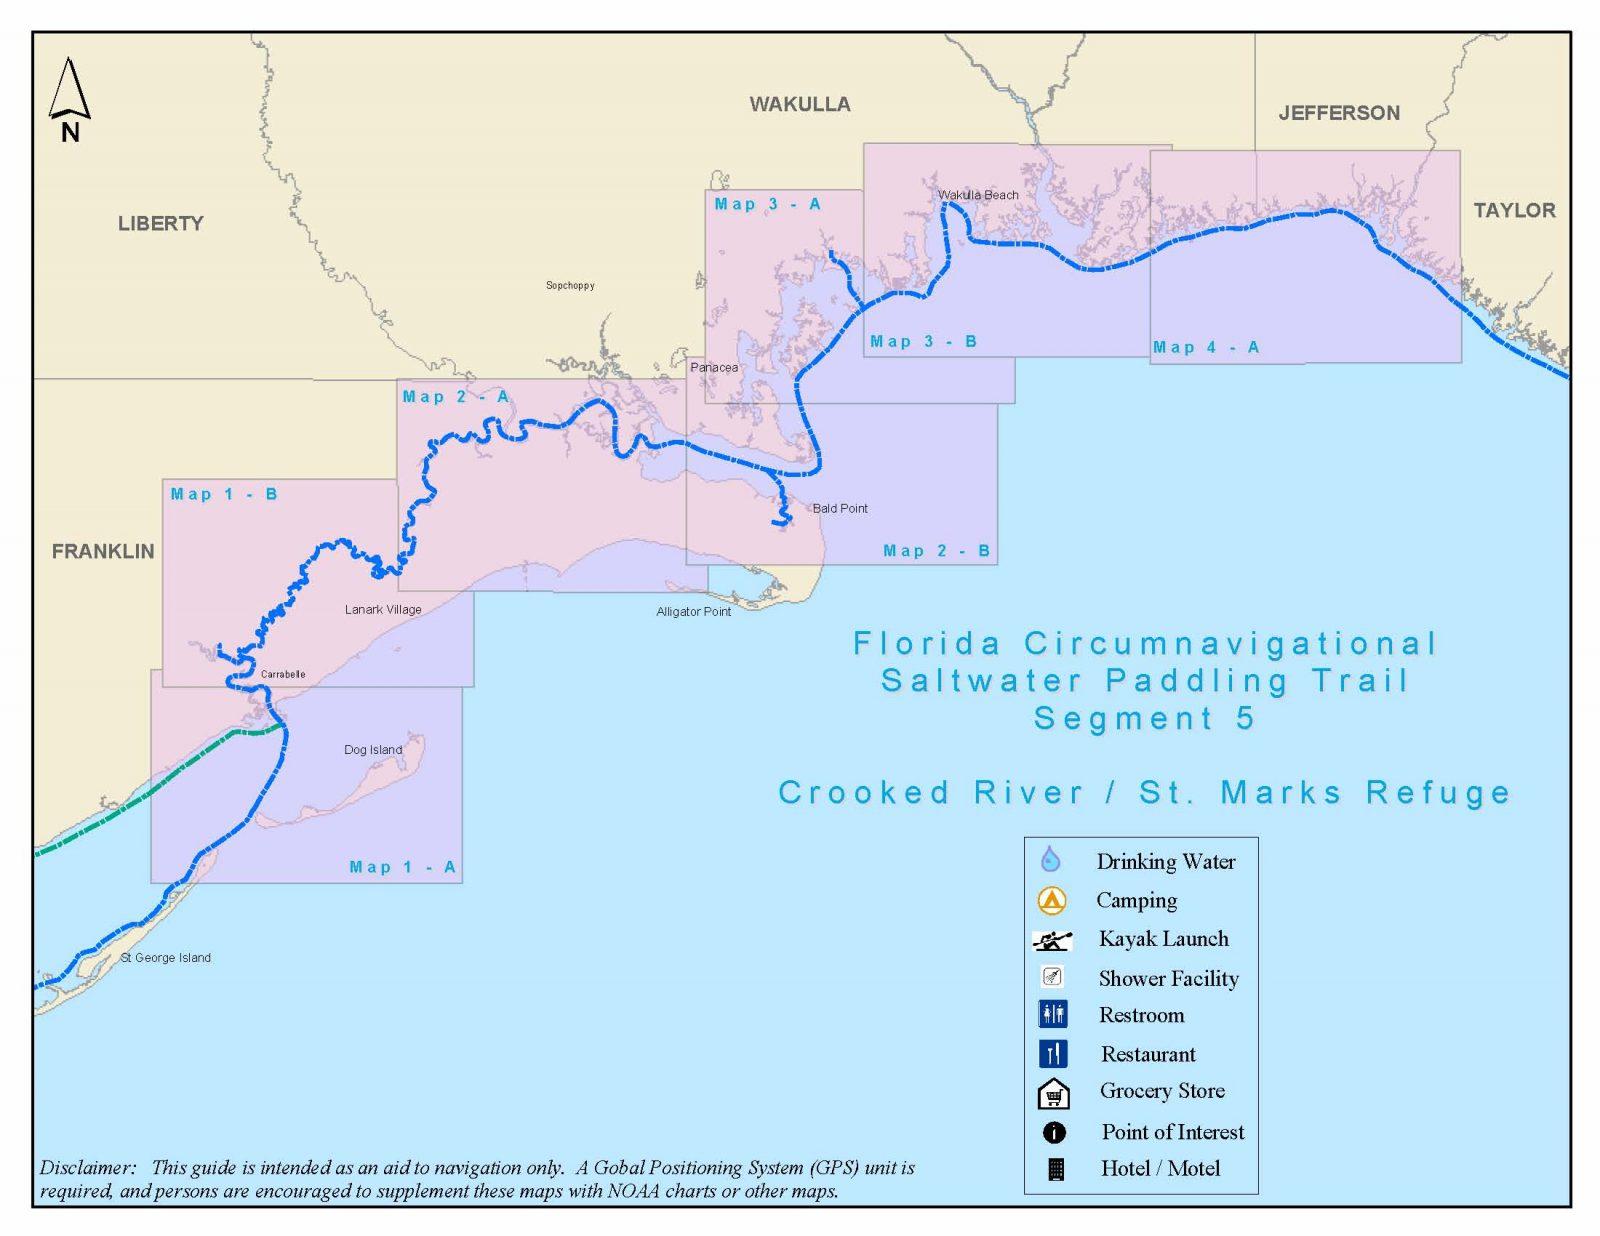 Florida Circumnavigational Saltwater Paddling Trail - Segment 5